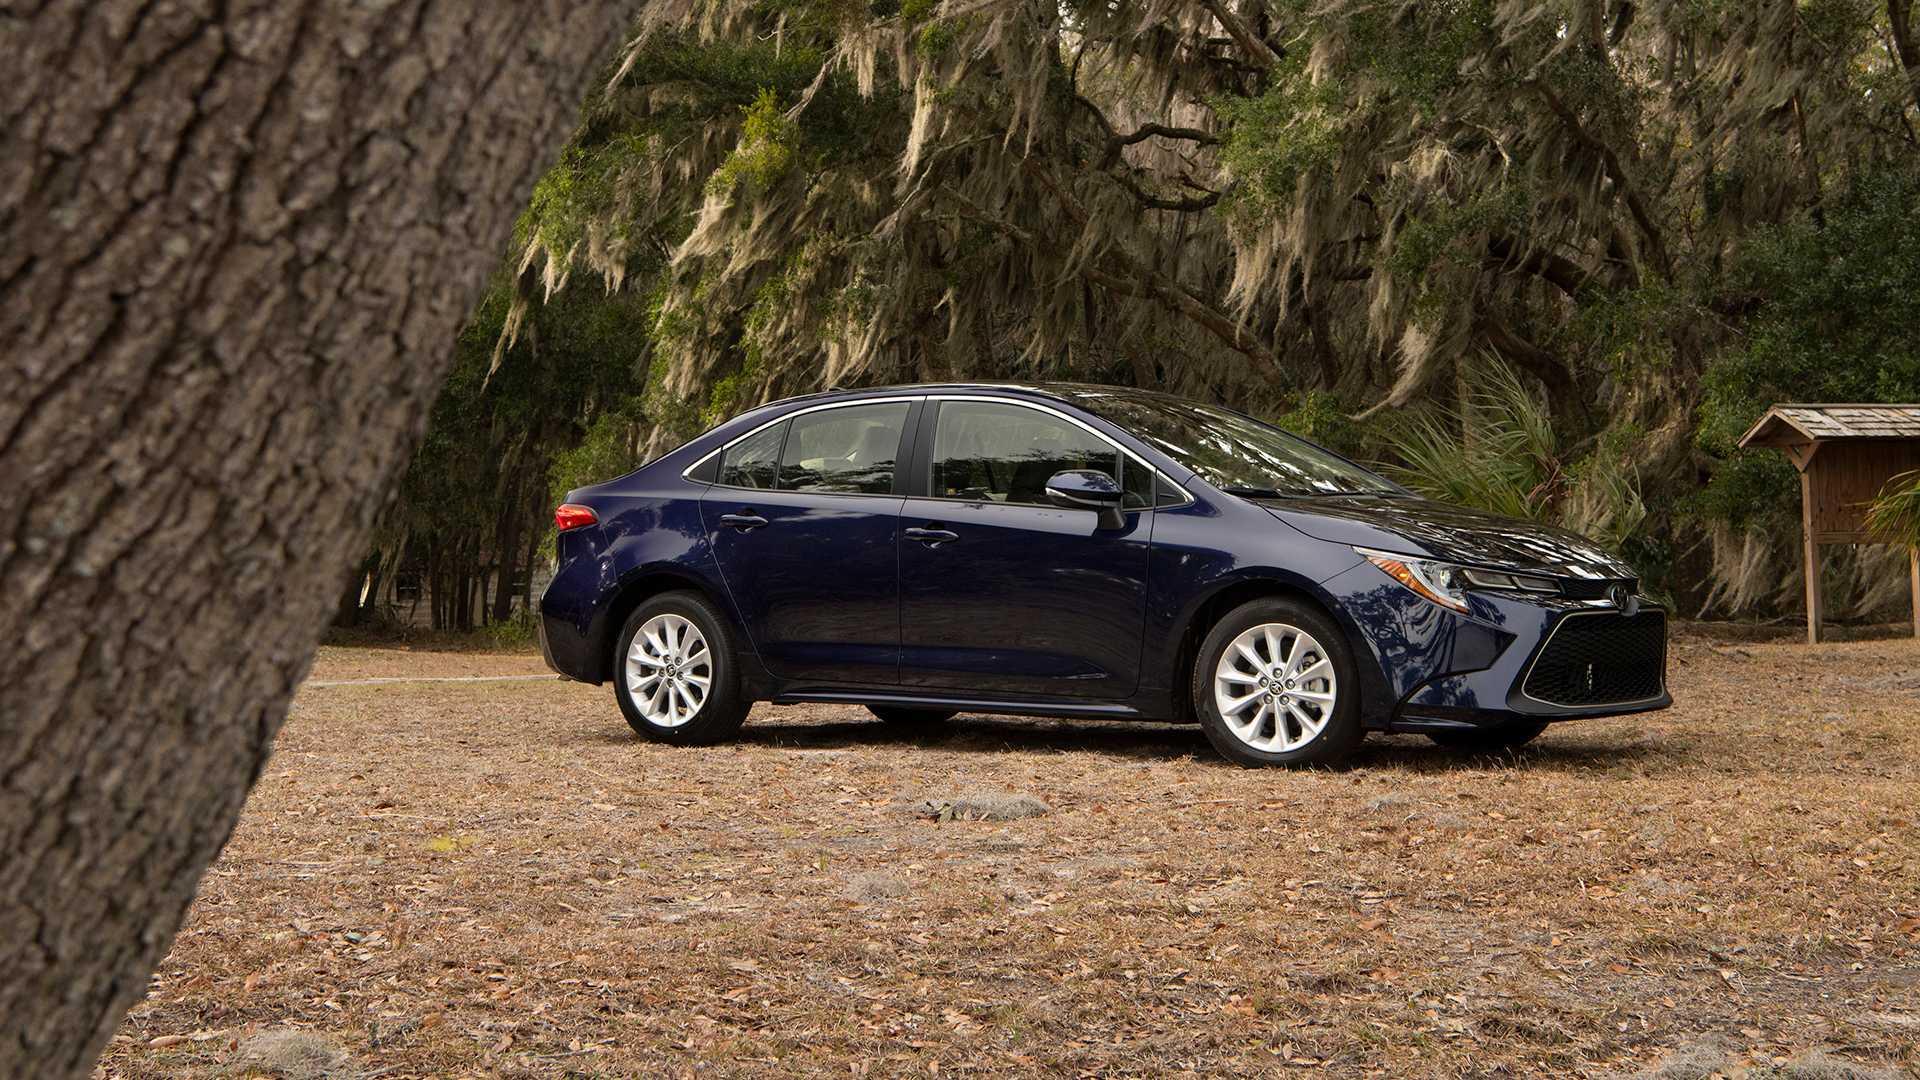 2020 Toyota Corolla Sedan First Drive: The Safe Choice